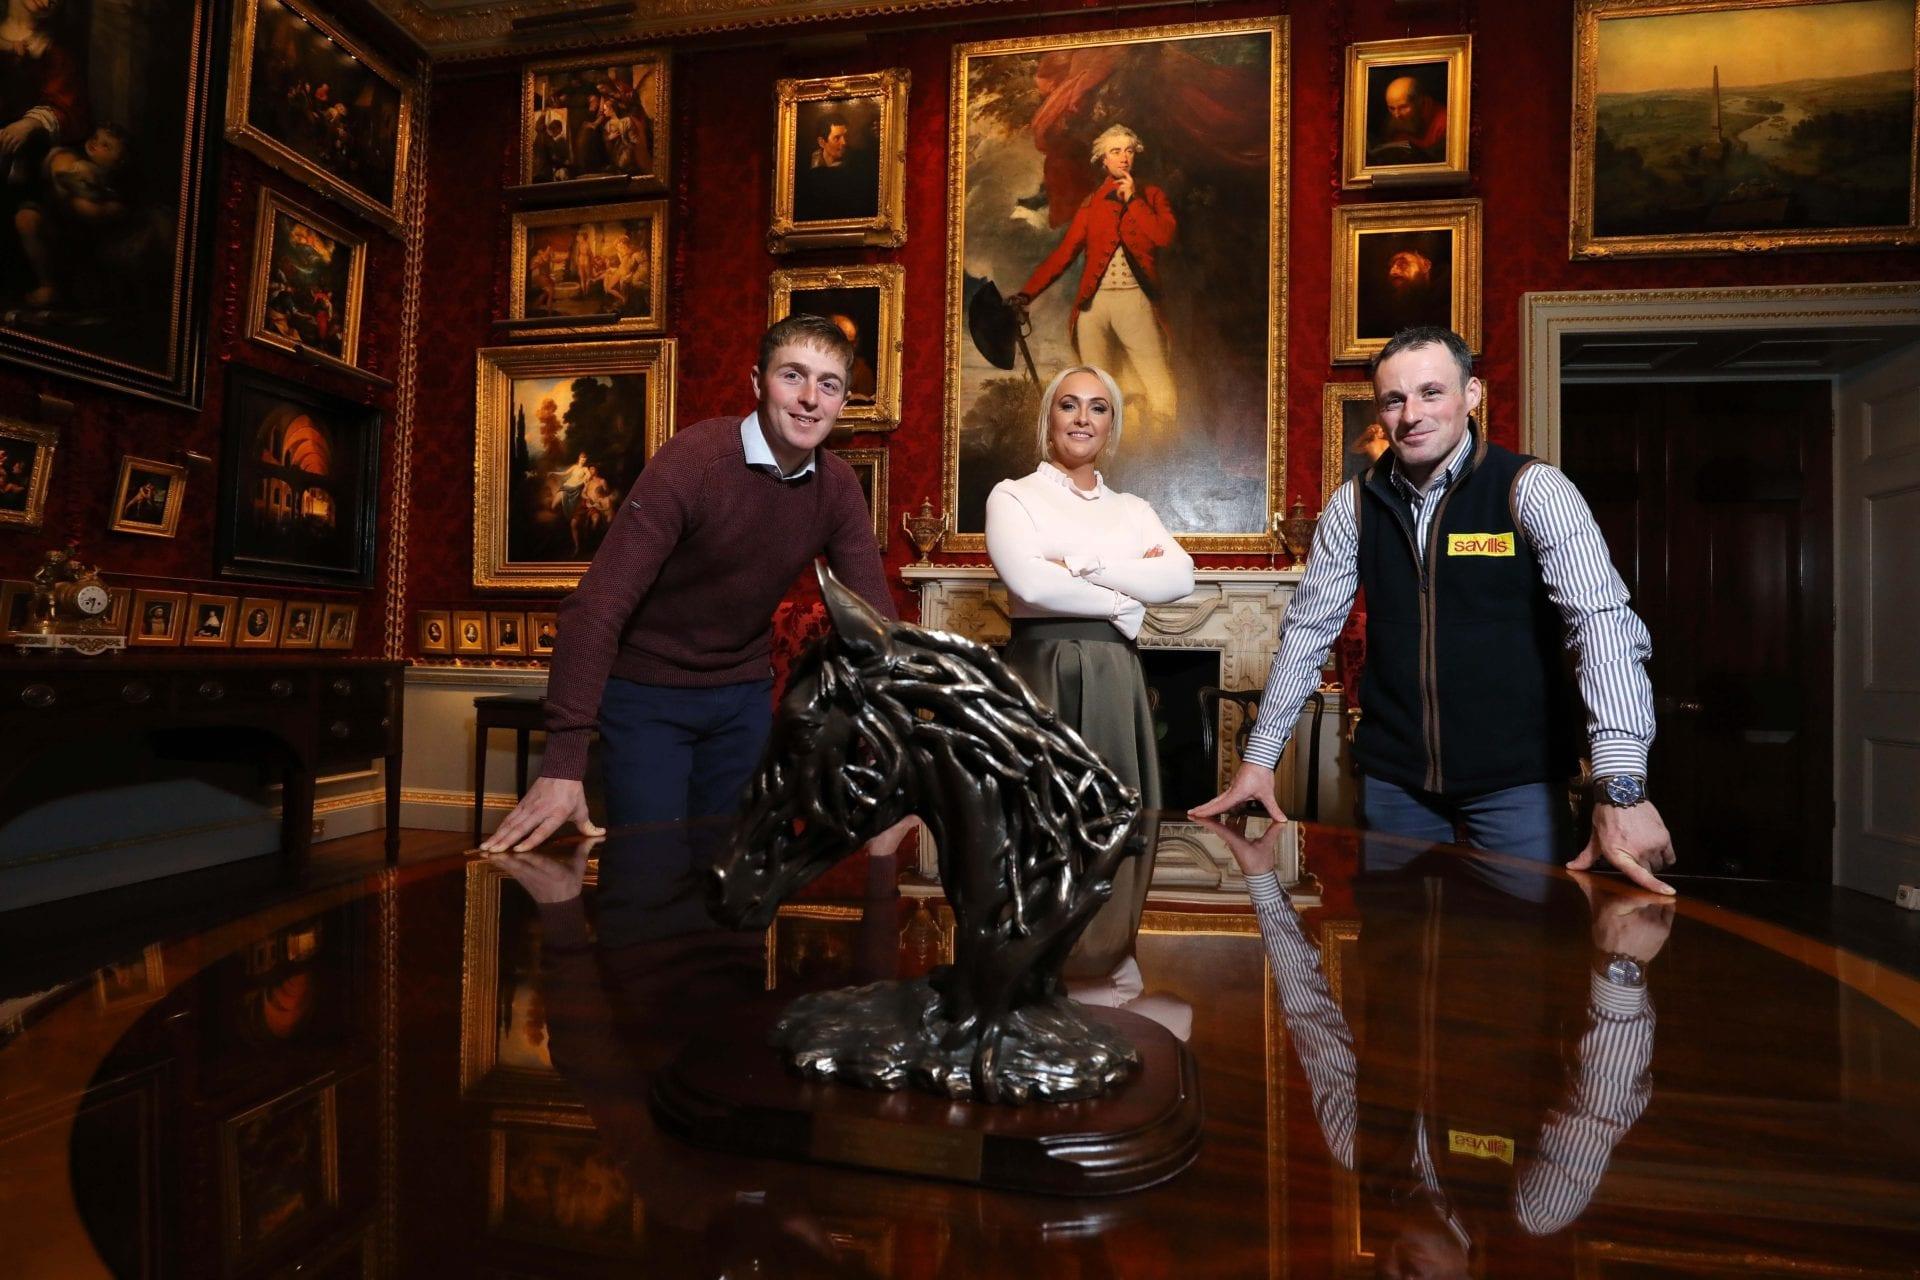 National Hunt race Northern Ireland